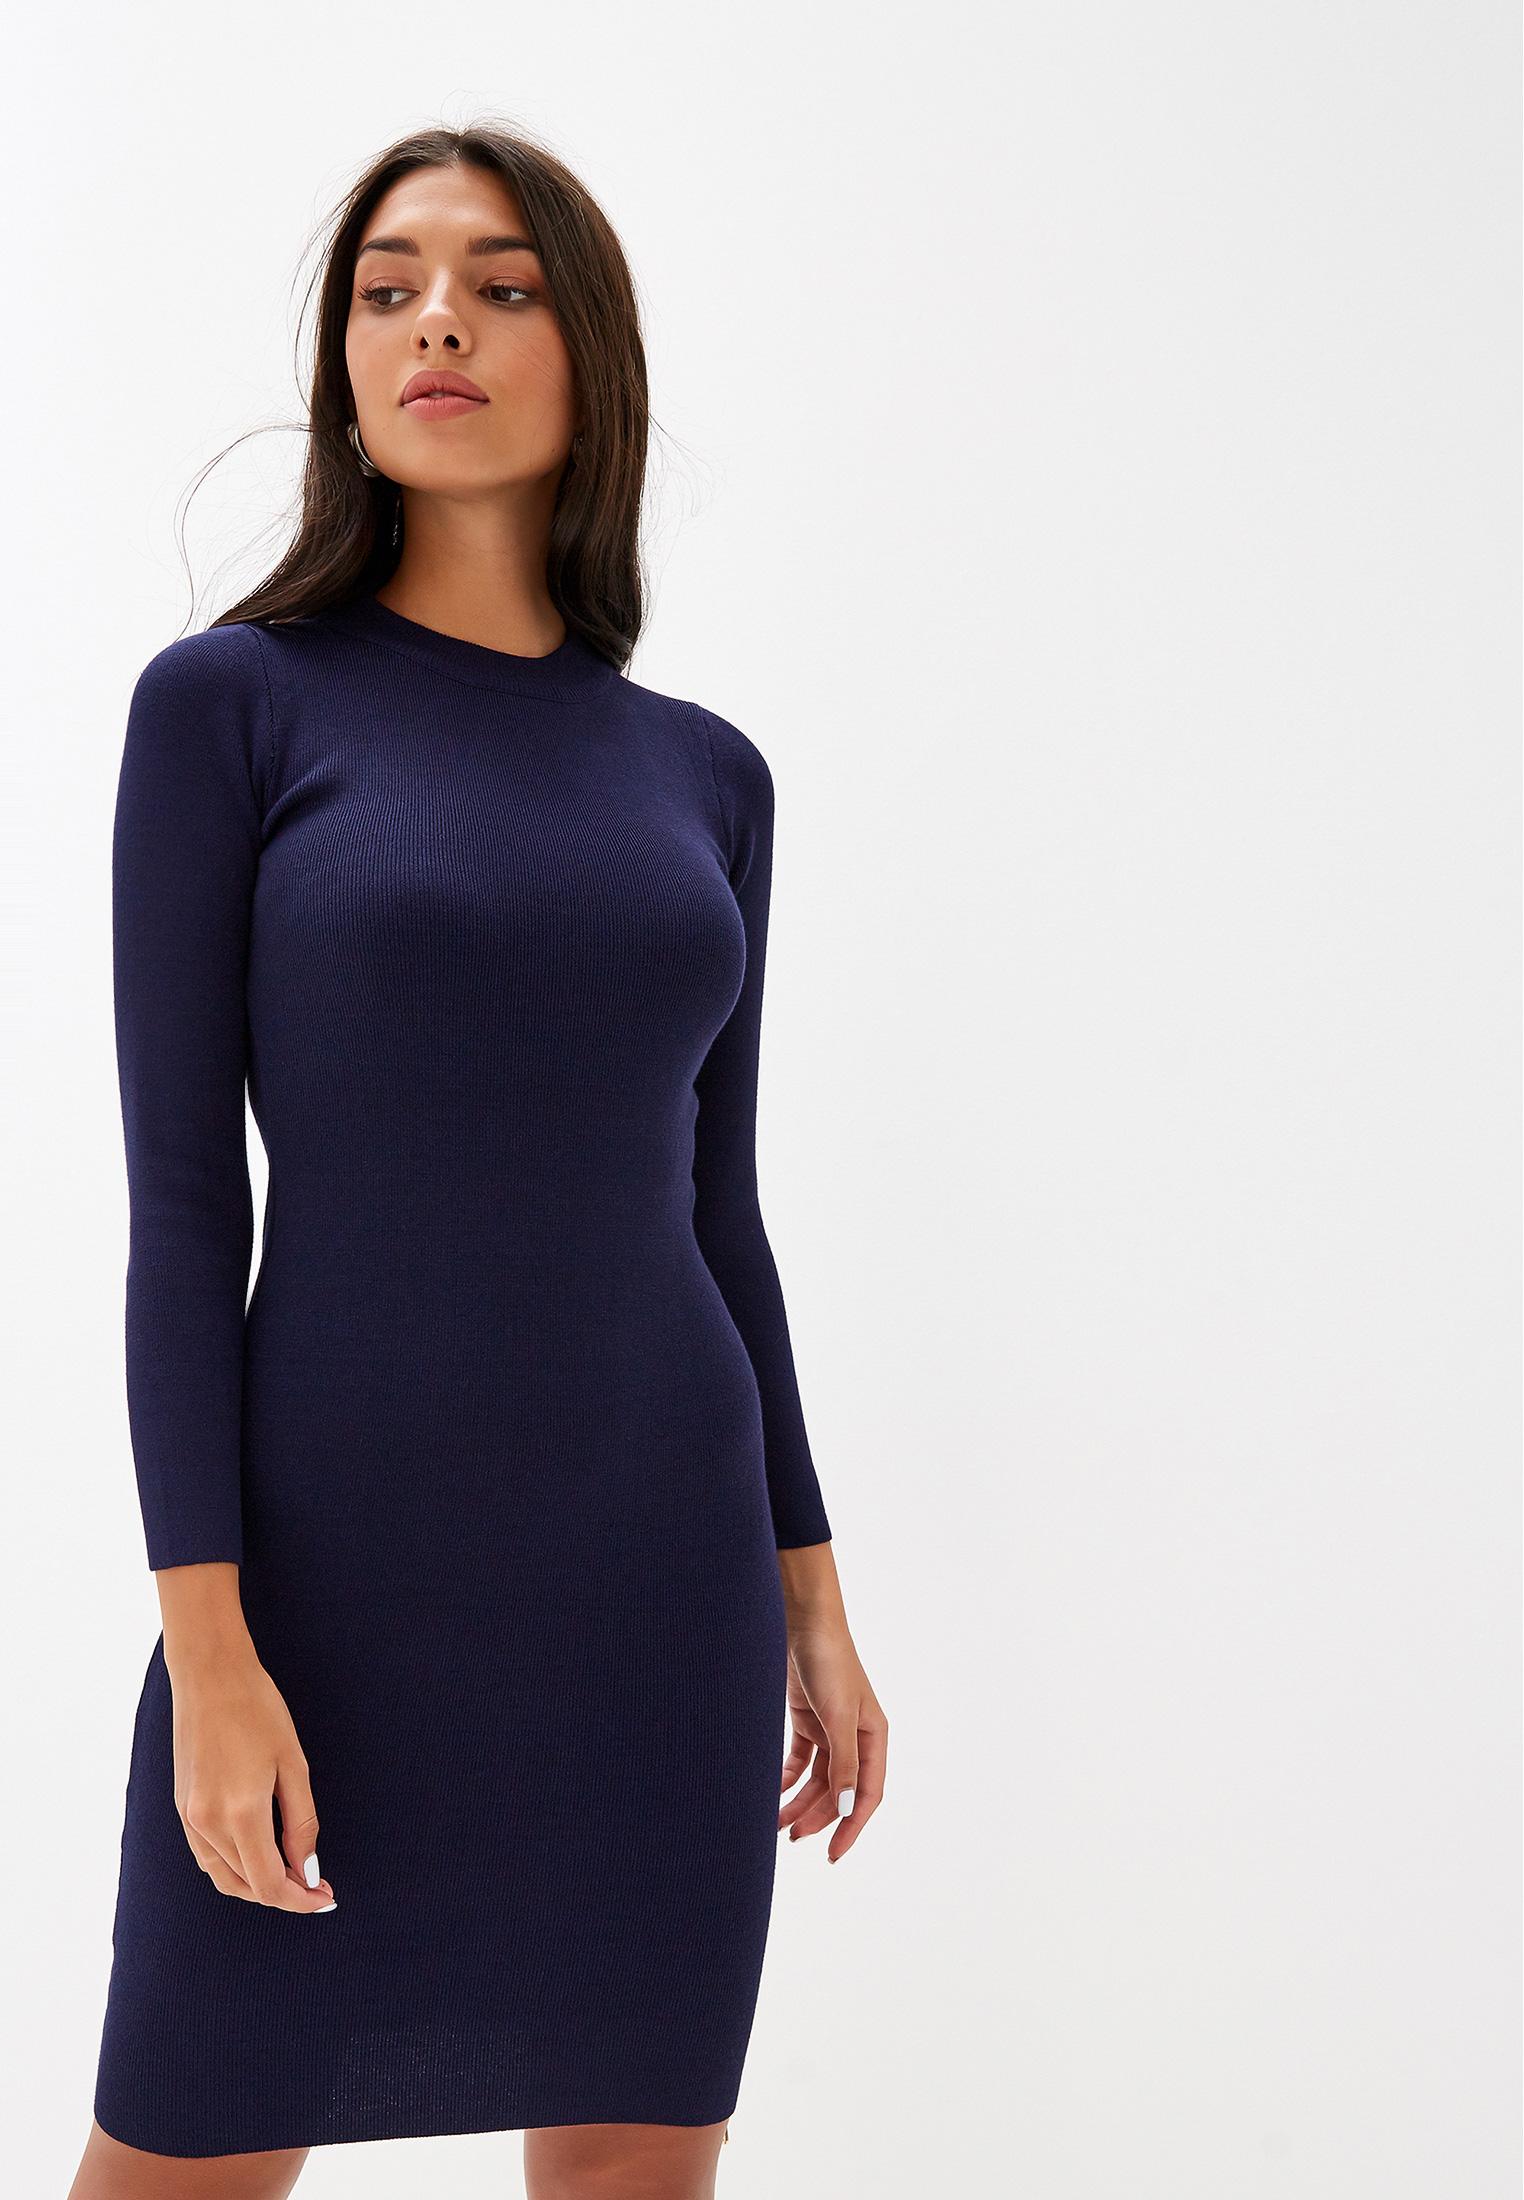 Вязаное платье Liana L323-1